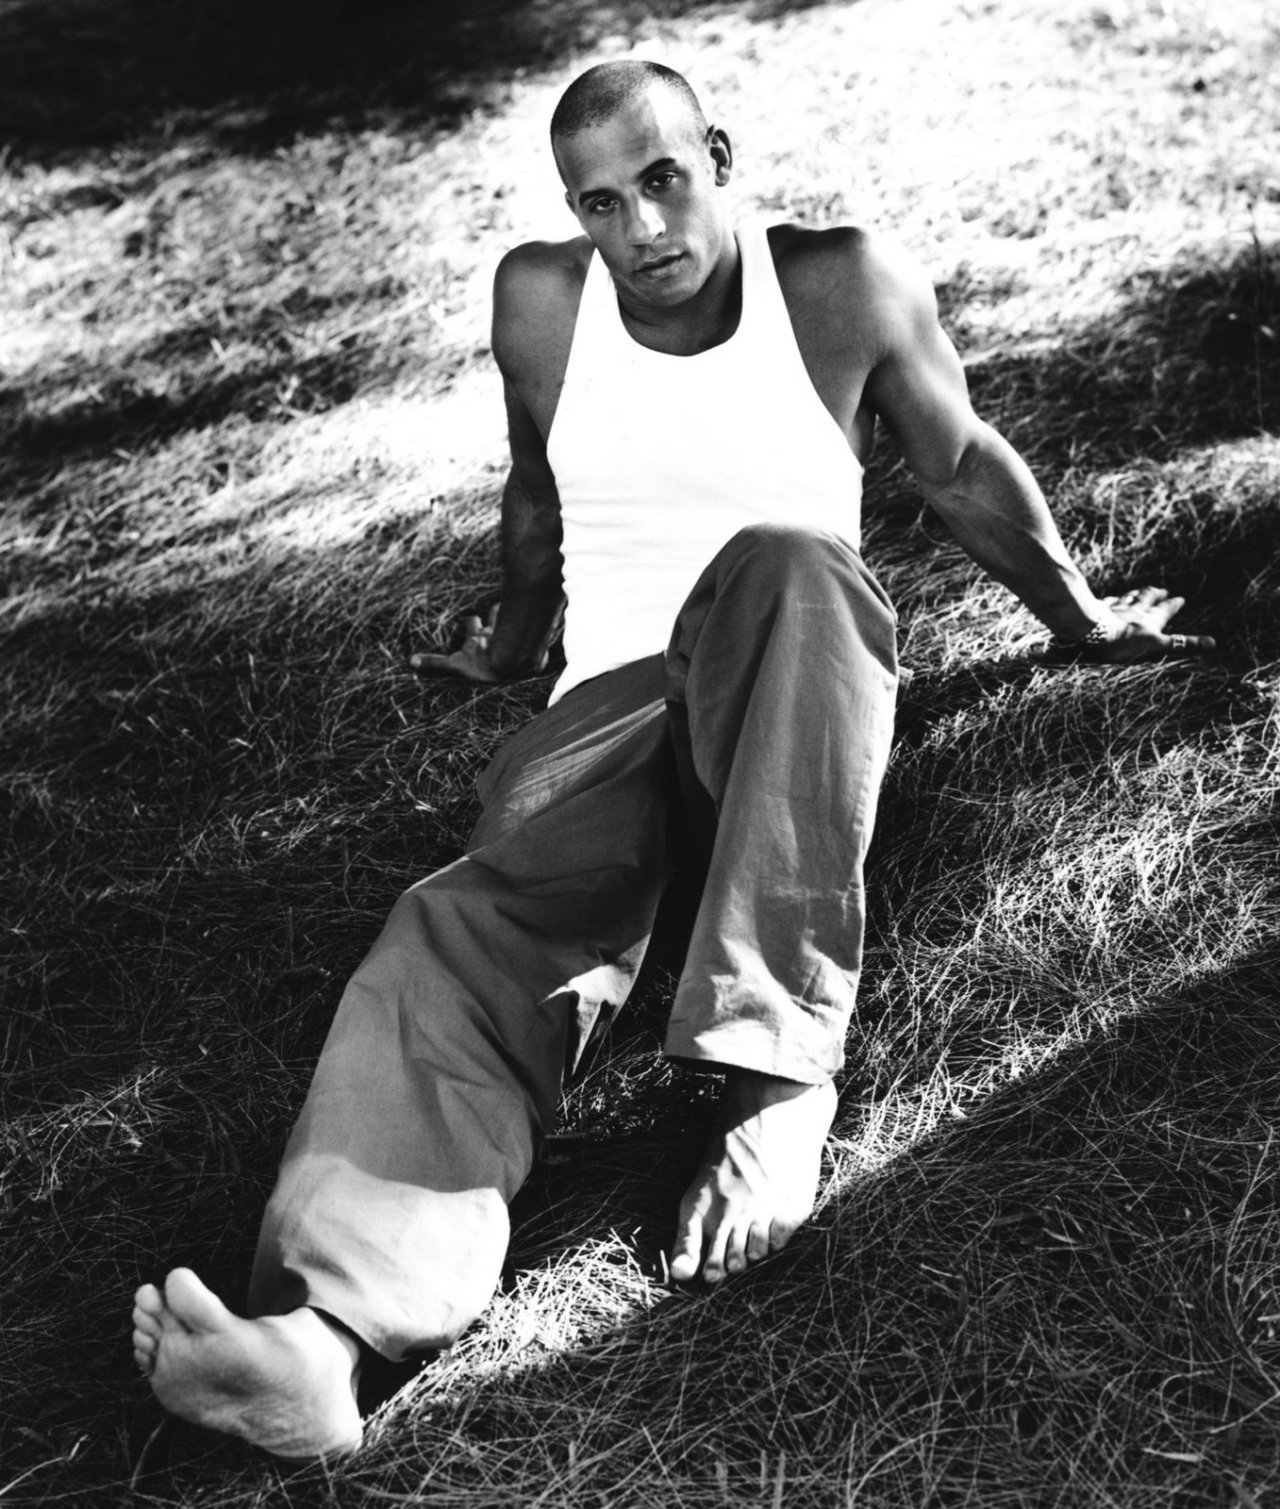 Feet Vin Diesel nudes (56 photo), Bikini